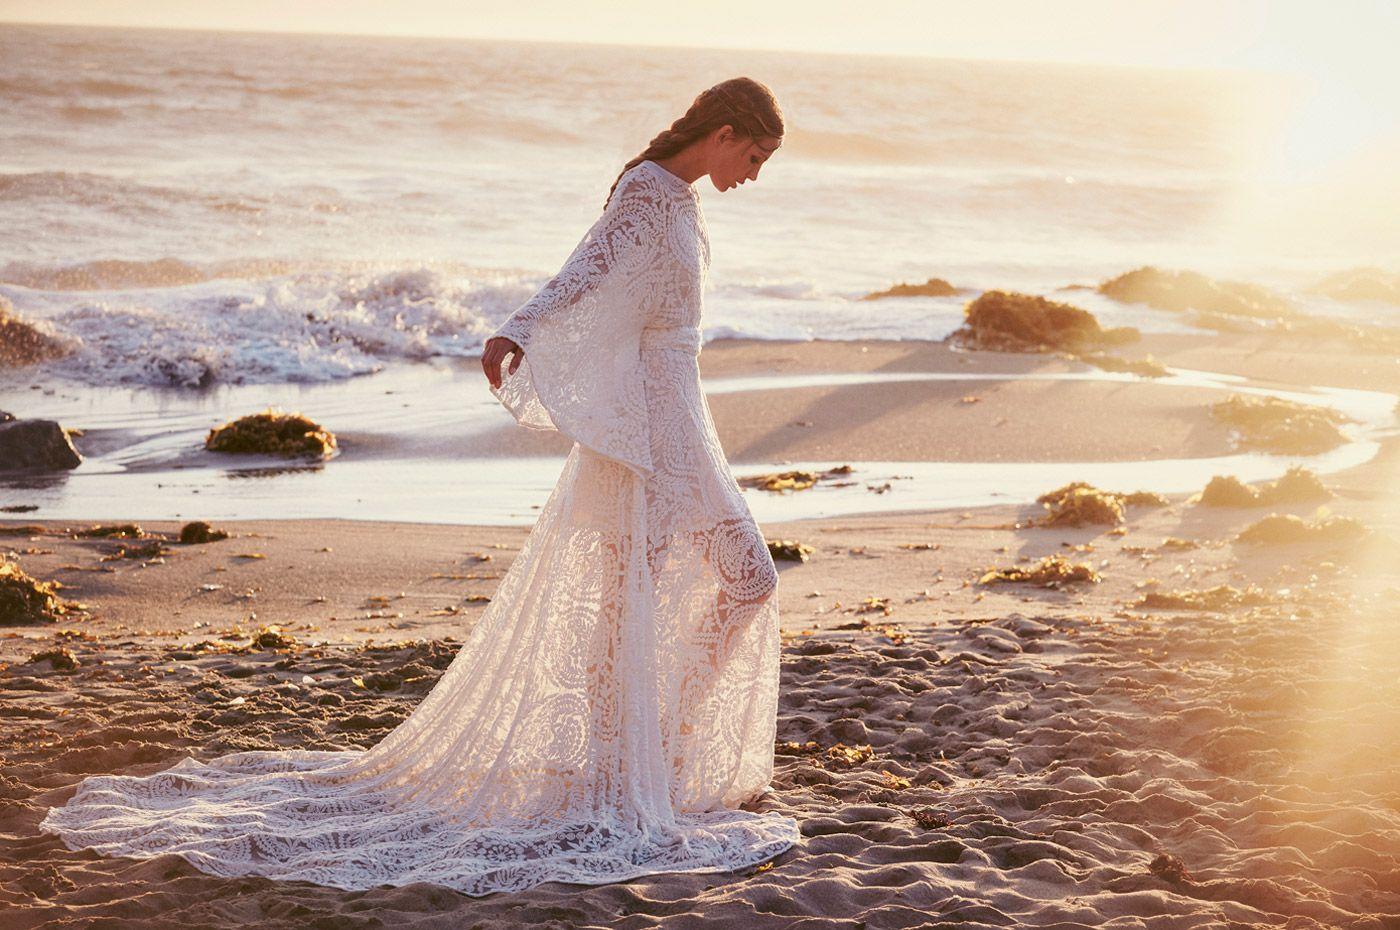 Free people womenus boho clothing u bohemian fashion lace